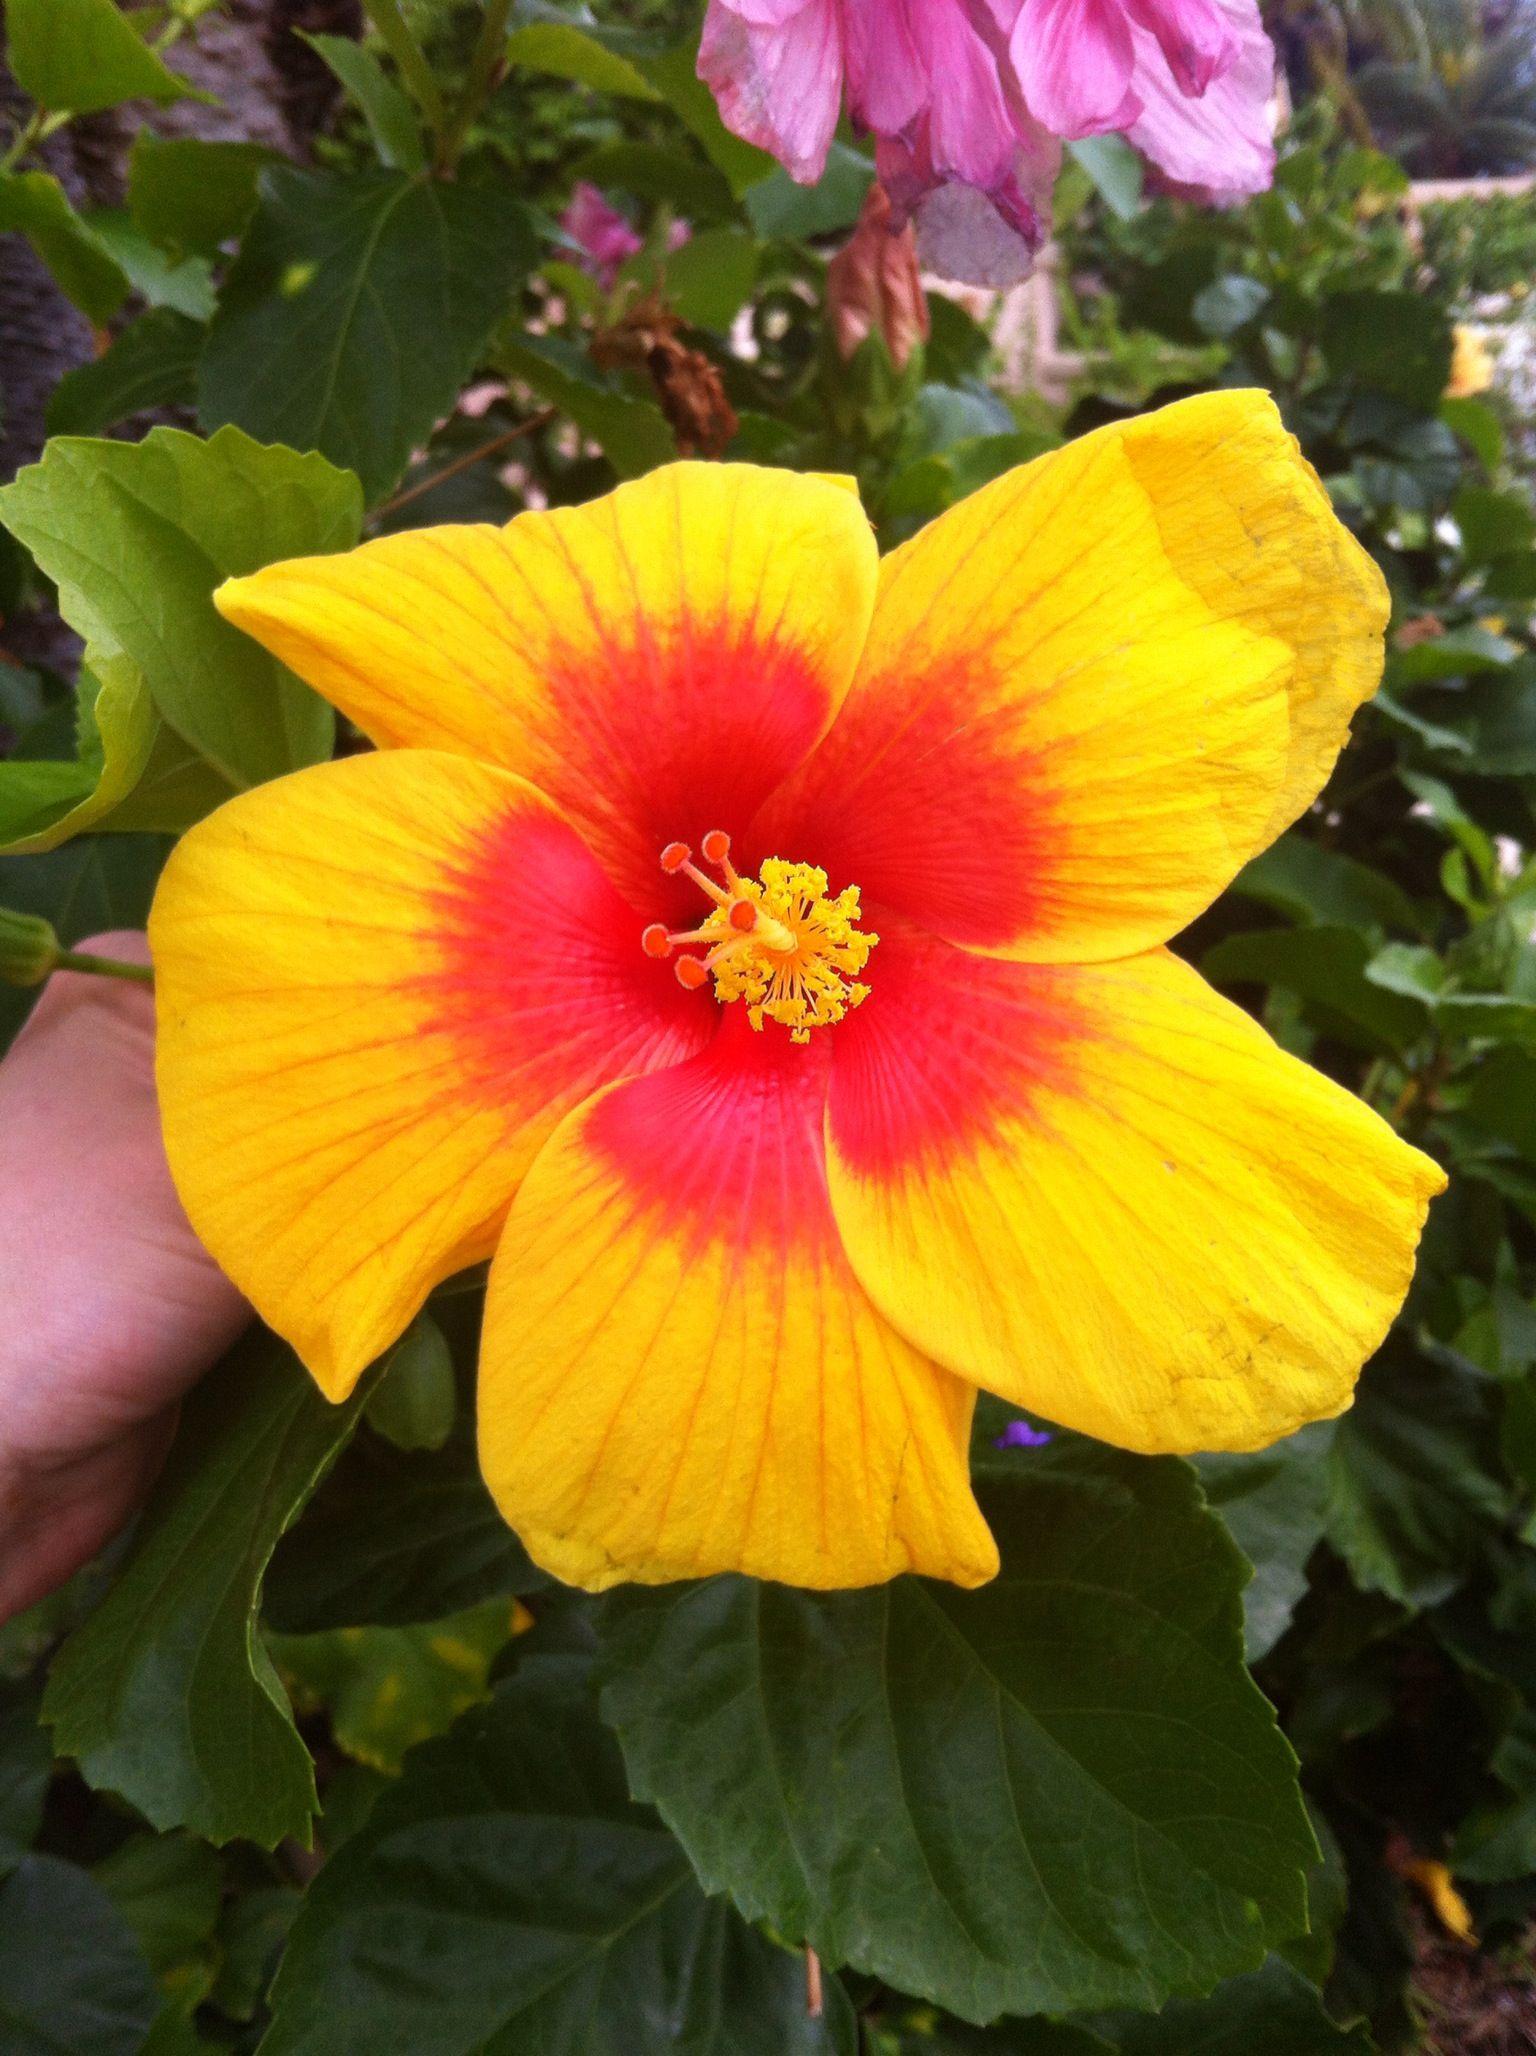 Beautiful hibiscus flower in st thomas us virgin islands earth beautiful hibiscus flower in st thomas us virgin islands izmirmasajfo Gallery